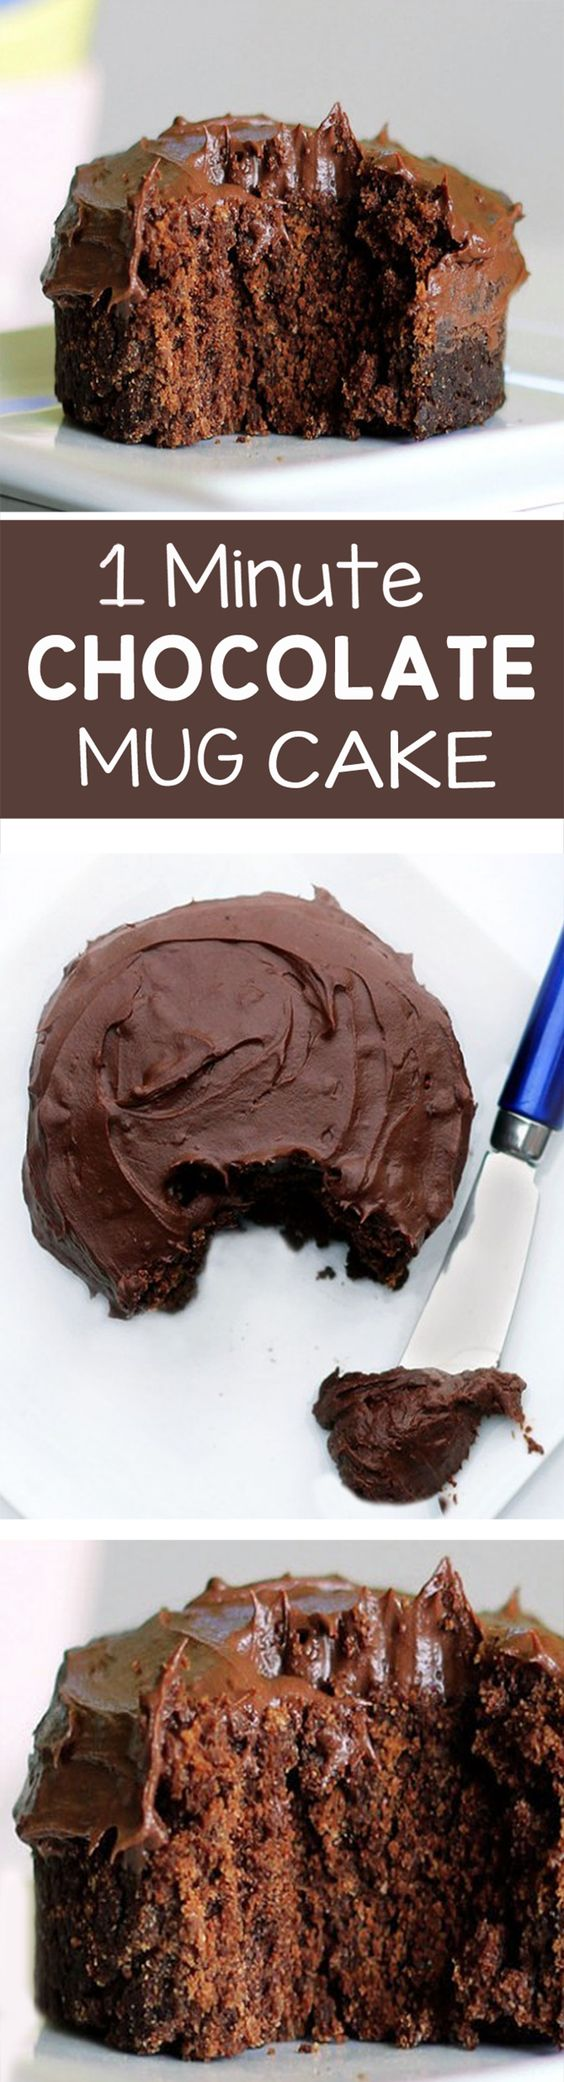 ... ideas and more chocolate cakes 200 calories chocolate cakes mug cakes